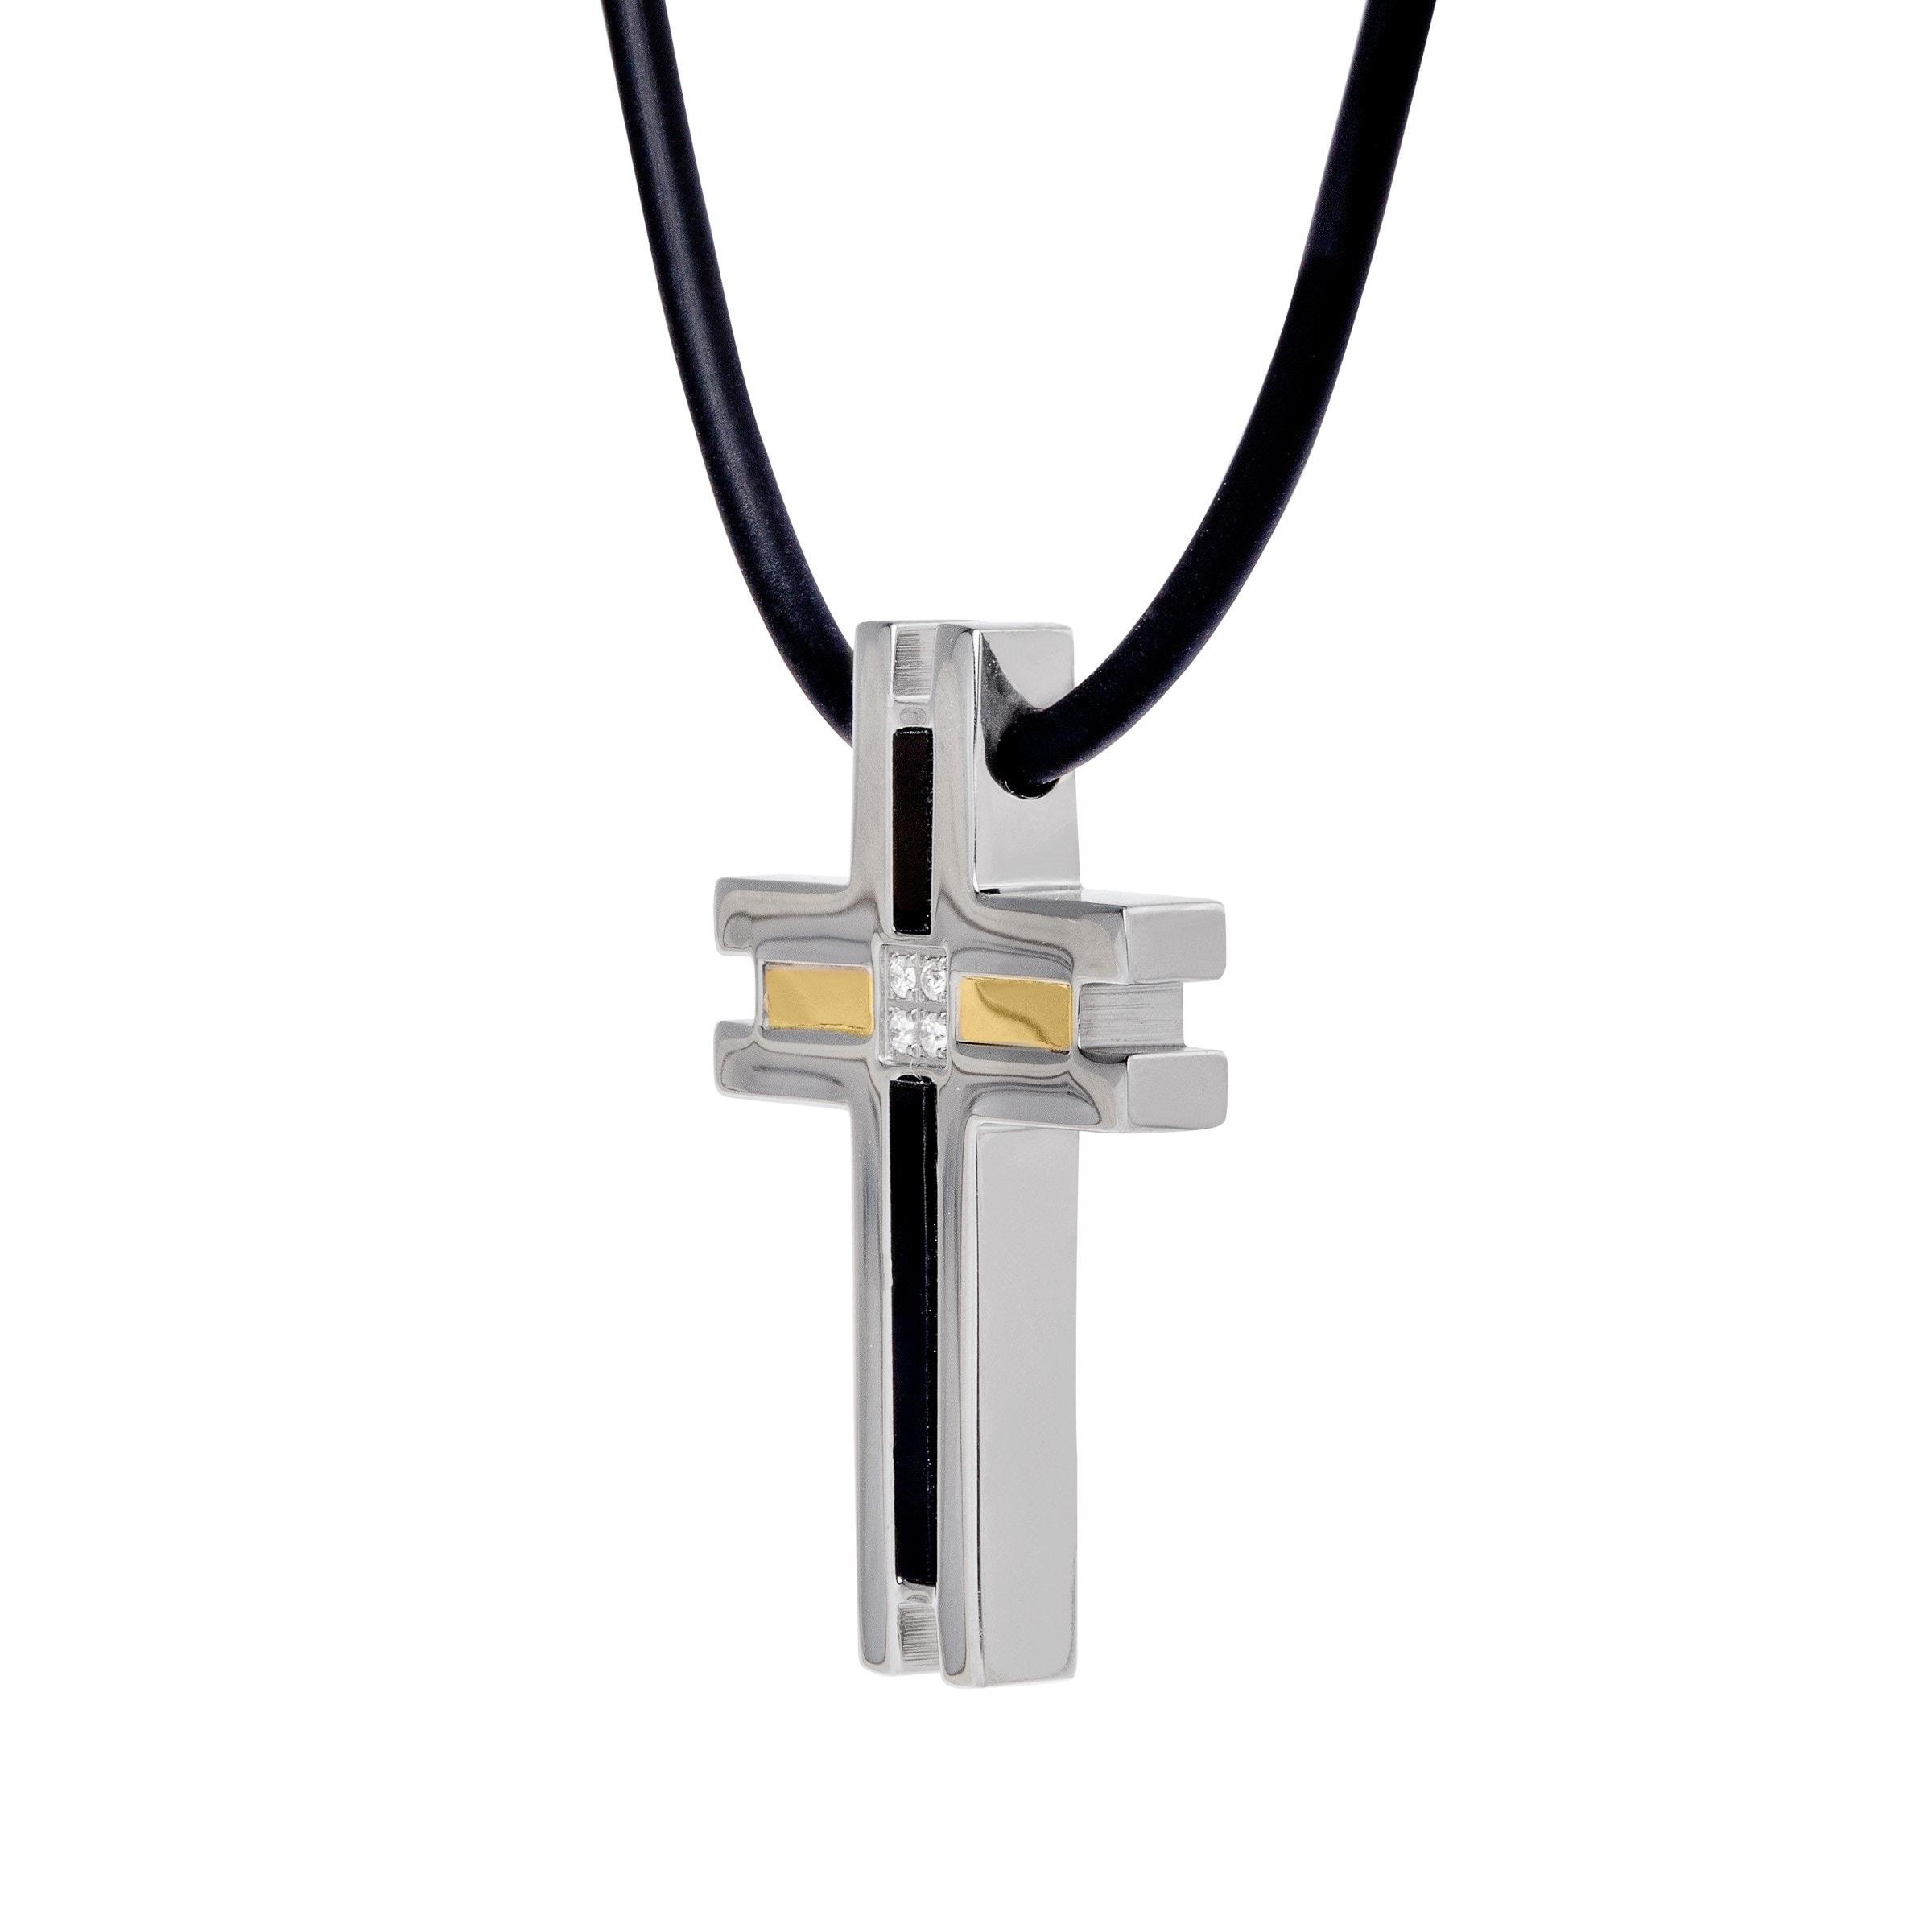 Shop dolan bullock mens onyx cross pendant with diamonds in shop dolan bullock mens onyx cross pendant with diamonds in stainless steel 18k gold free shipping today overstock 15795353 aloadofball Choice Image